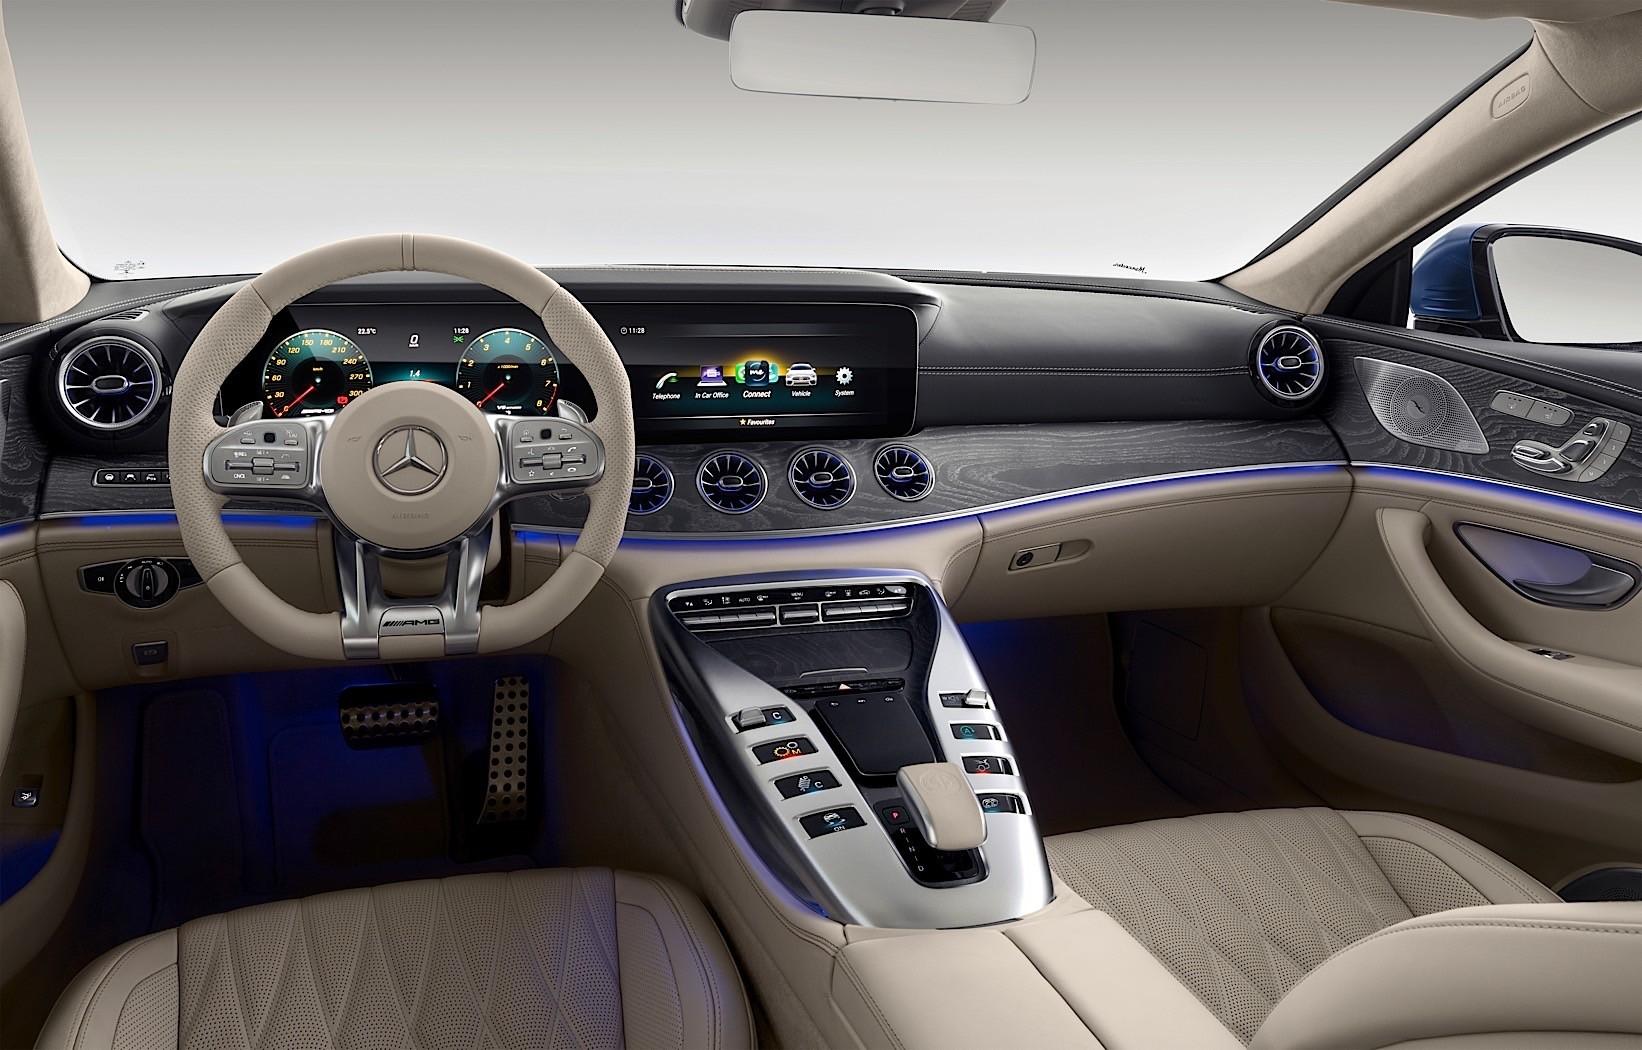 2019 Mercedes Amg Gt 4 Door Coupe Goes Live In Geneva Autoevolution